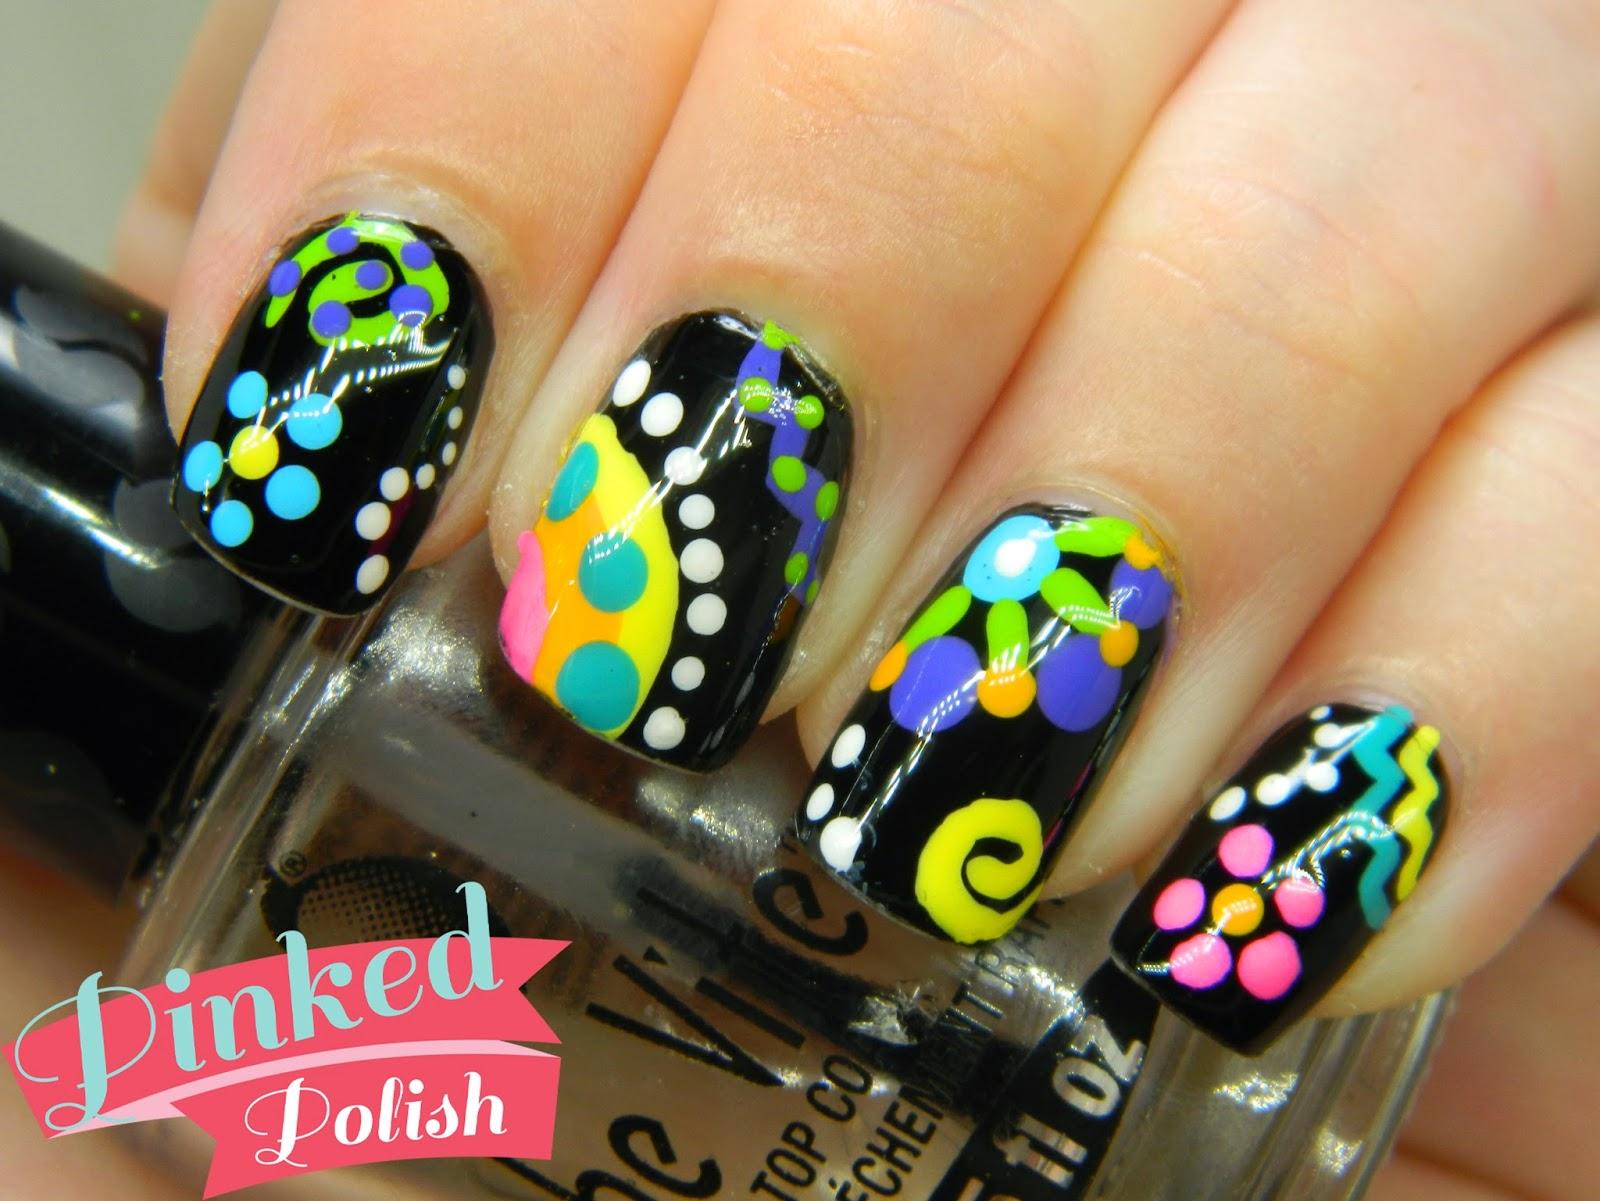 Pinked Polish Nail Art Fun